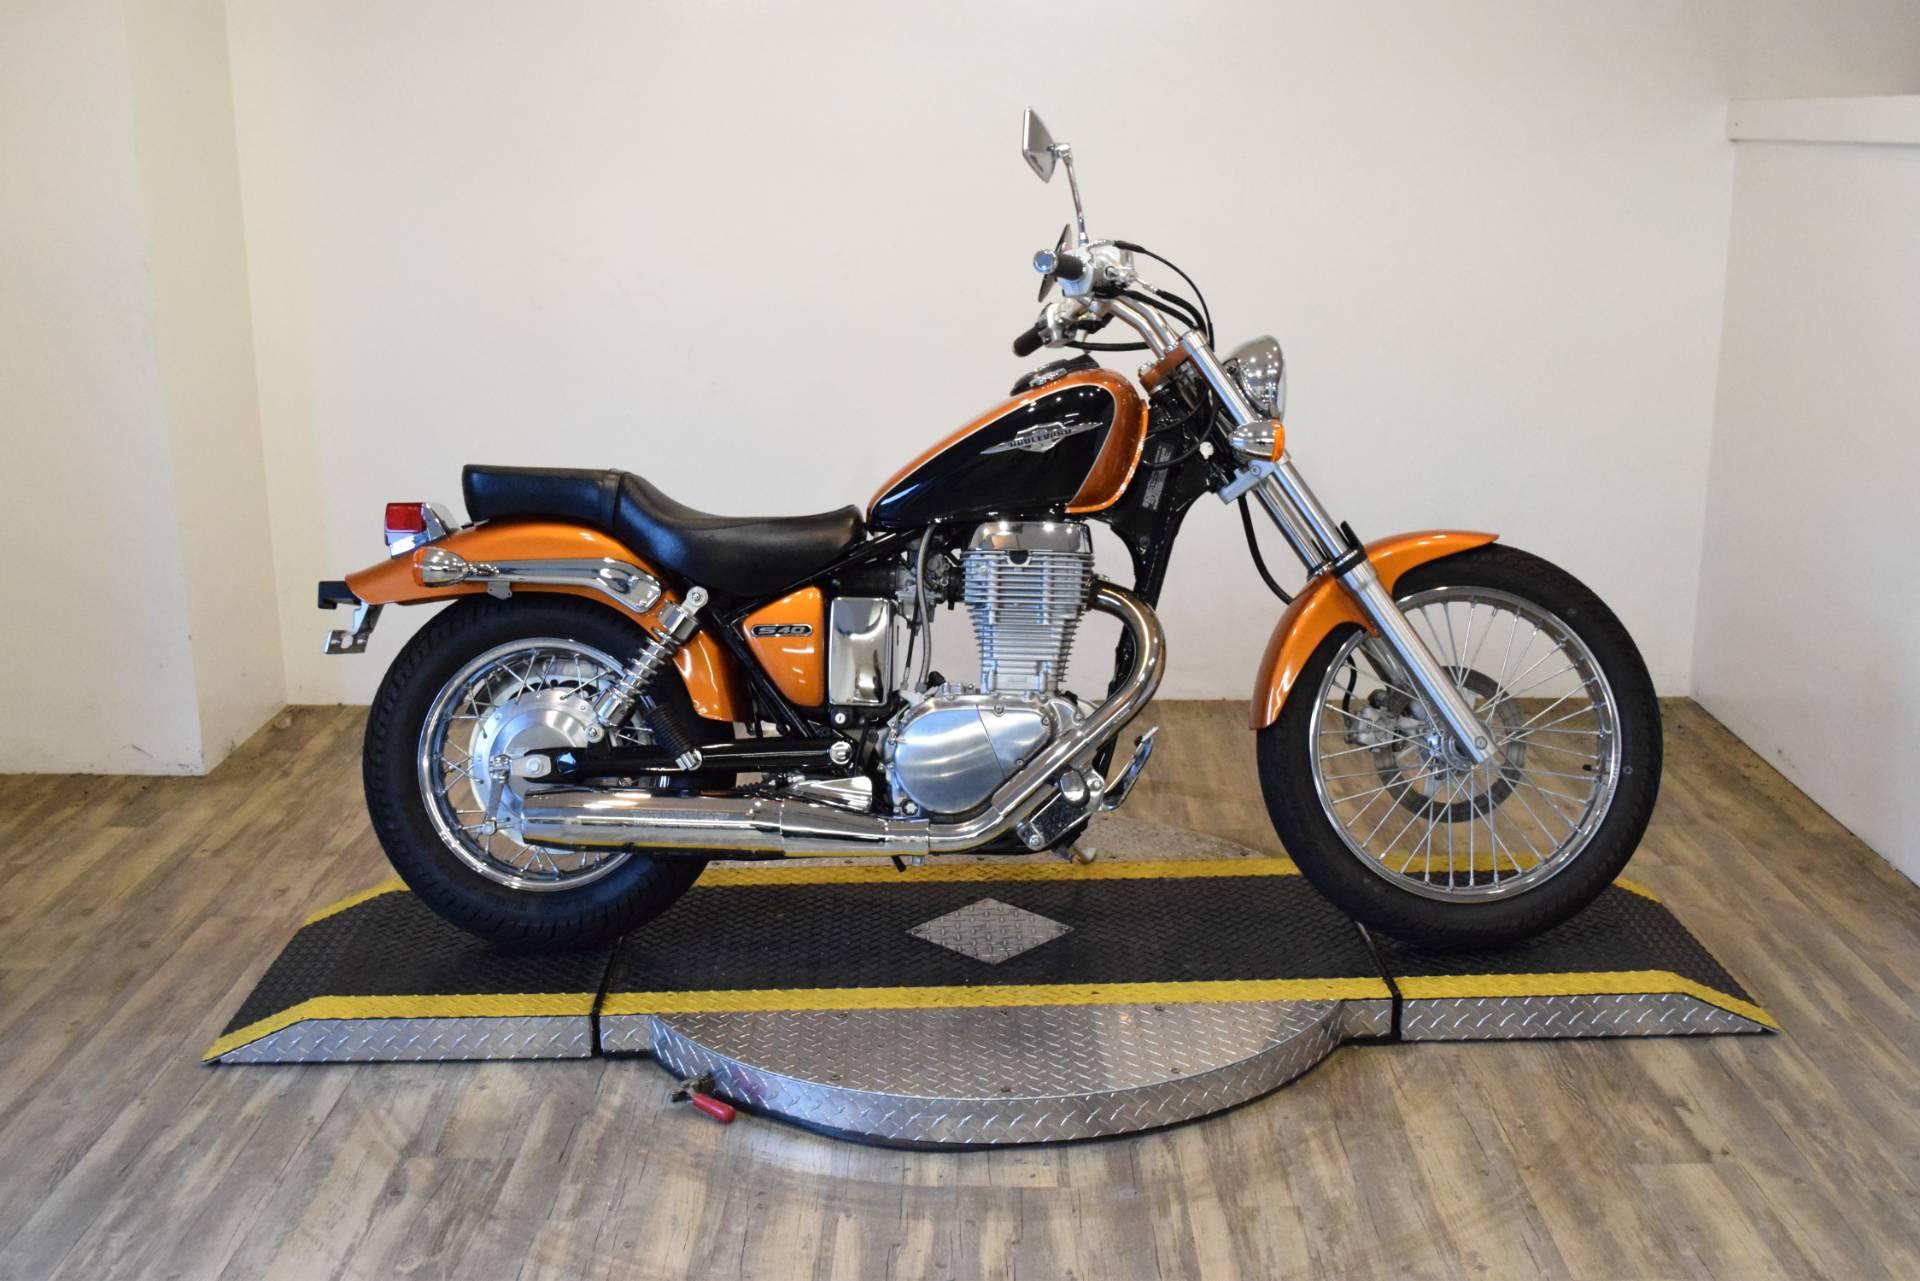 2012 Suzuki Boulevard S40 Used Motorcycle for Sale Wauconda Illinois